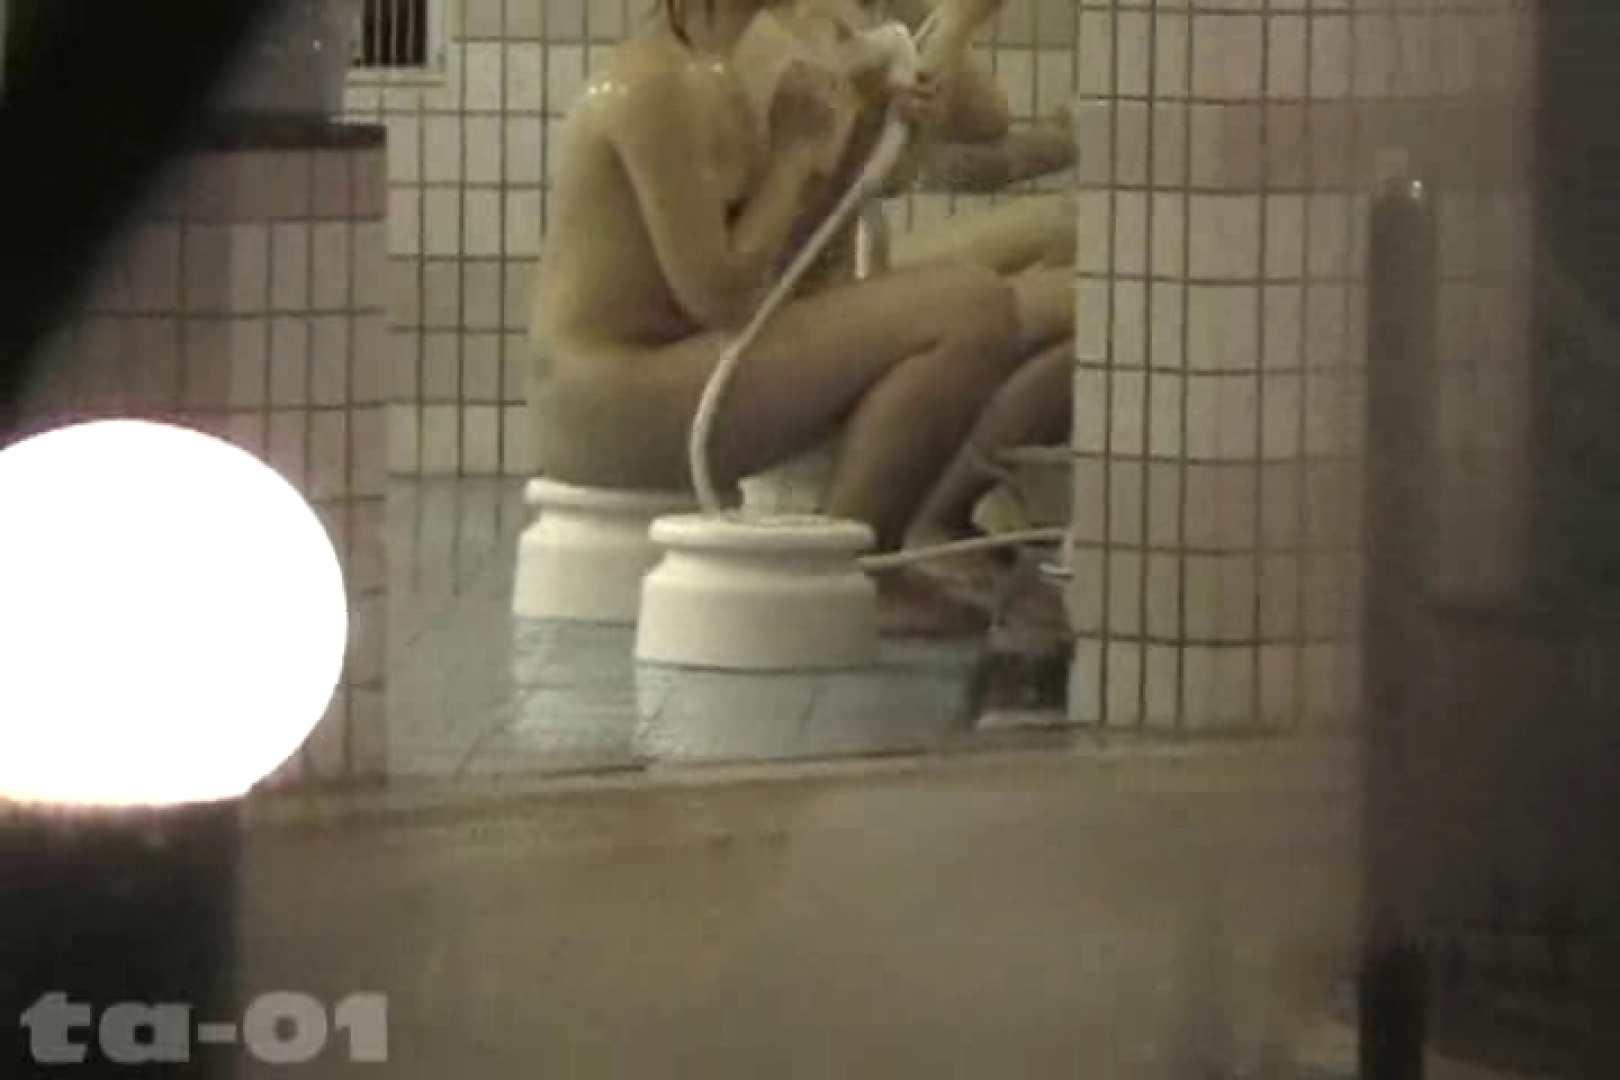 合宿ホテル女風呂盗撮高画質版 Vol.01 盗撮・必見 濡れ場動画紹介 106画像 92